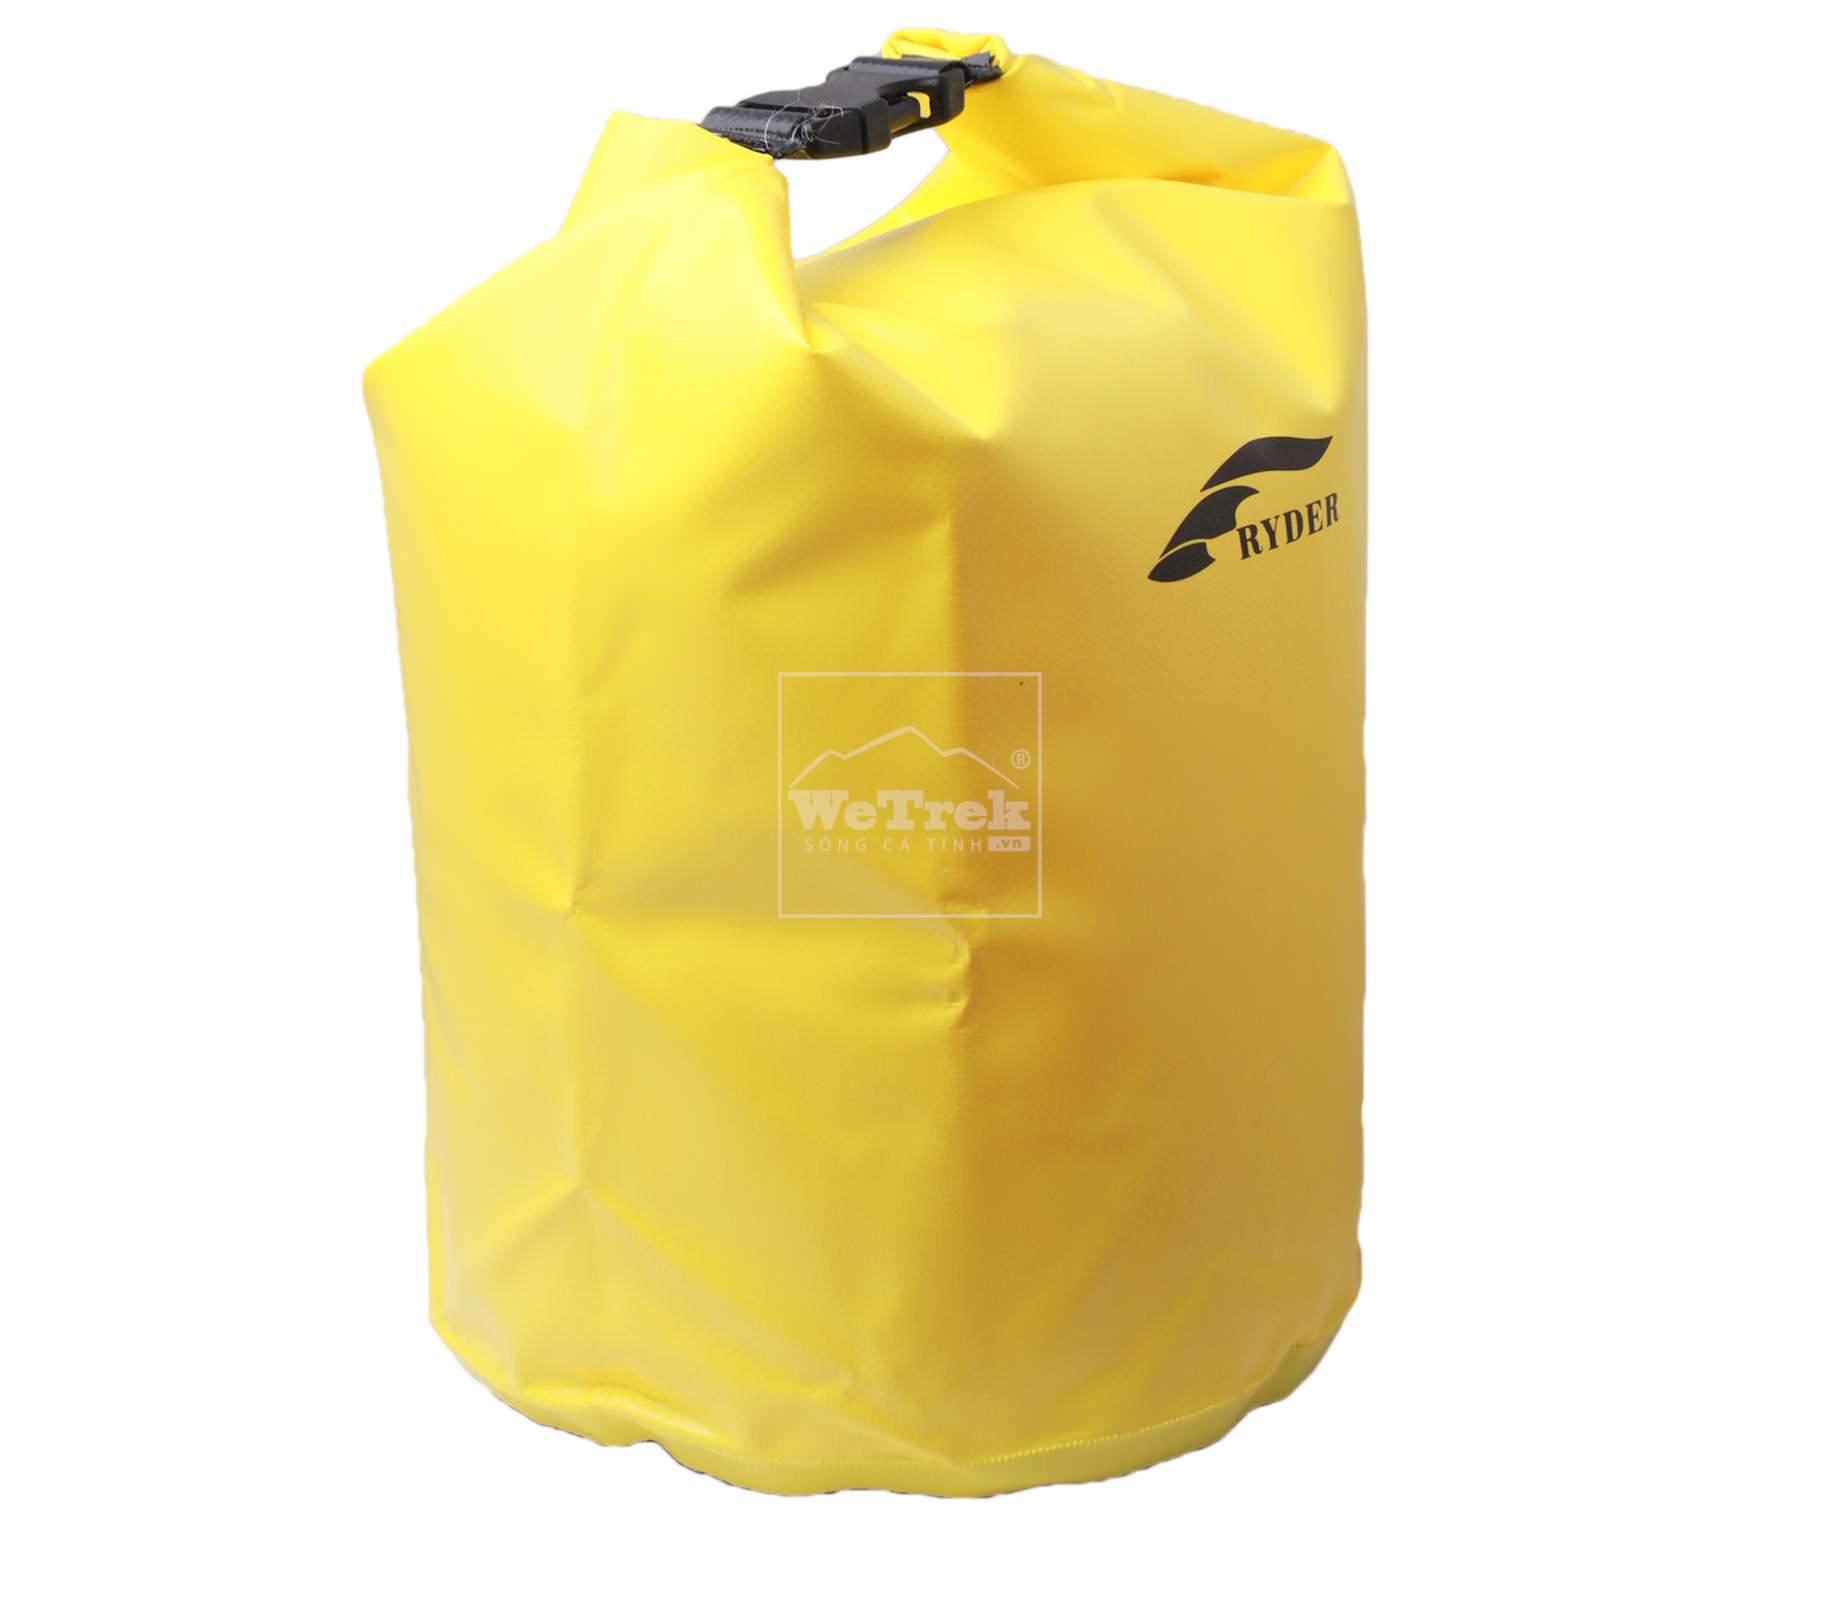 tui-kho-chong-nuoc-30l-ryder-pvc-taupaulin-dry-bag-c1004-6670-1